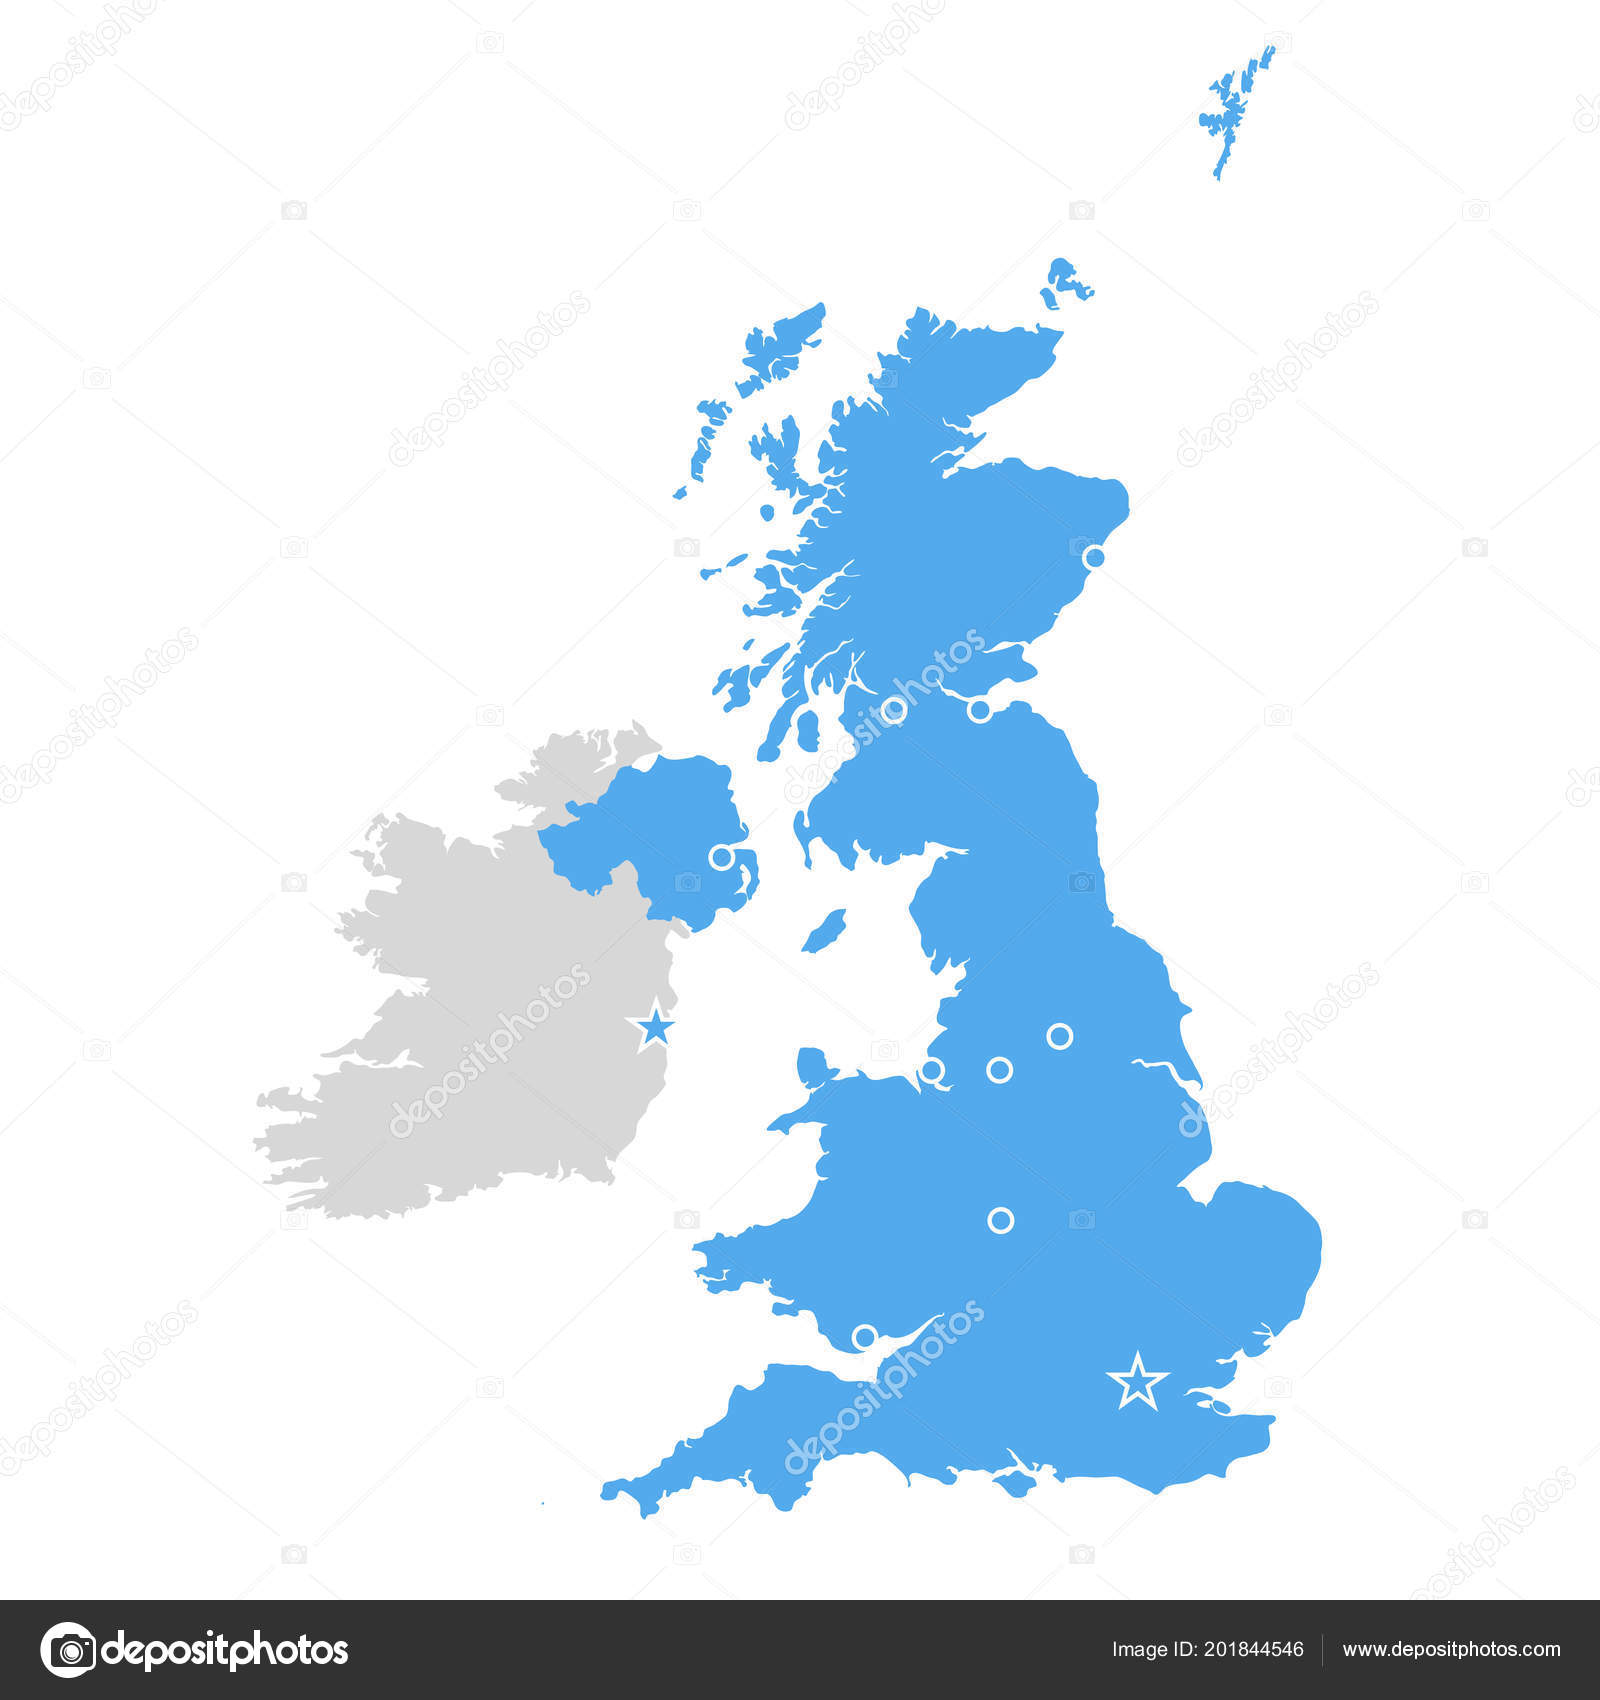 Map Of Uk Scotland And Ireland.Great Britain Map United Kingdom Scotland Ireland Contour Stock